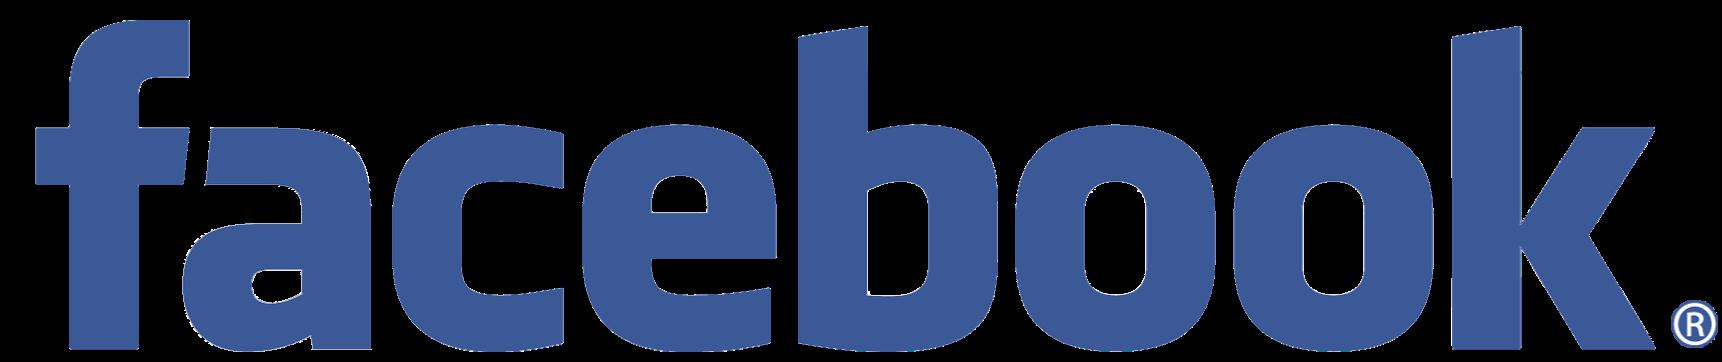 Facebook PNG - 3652